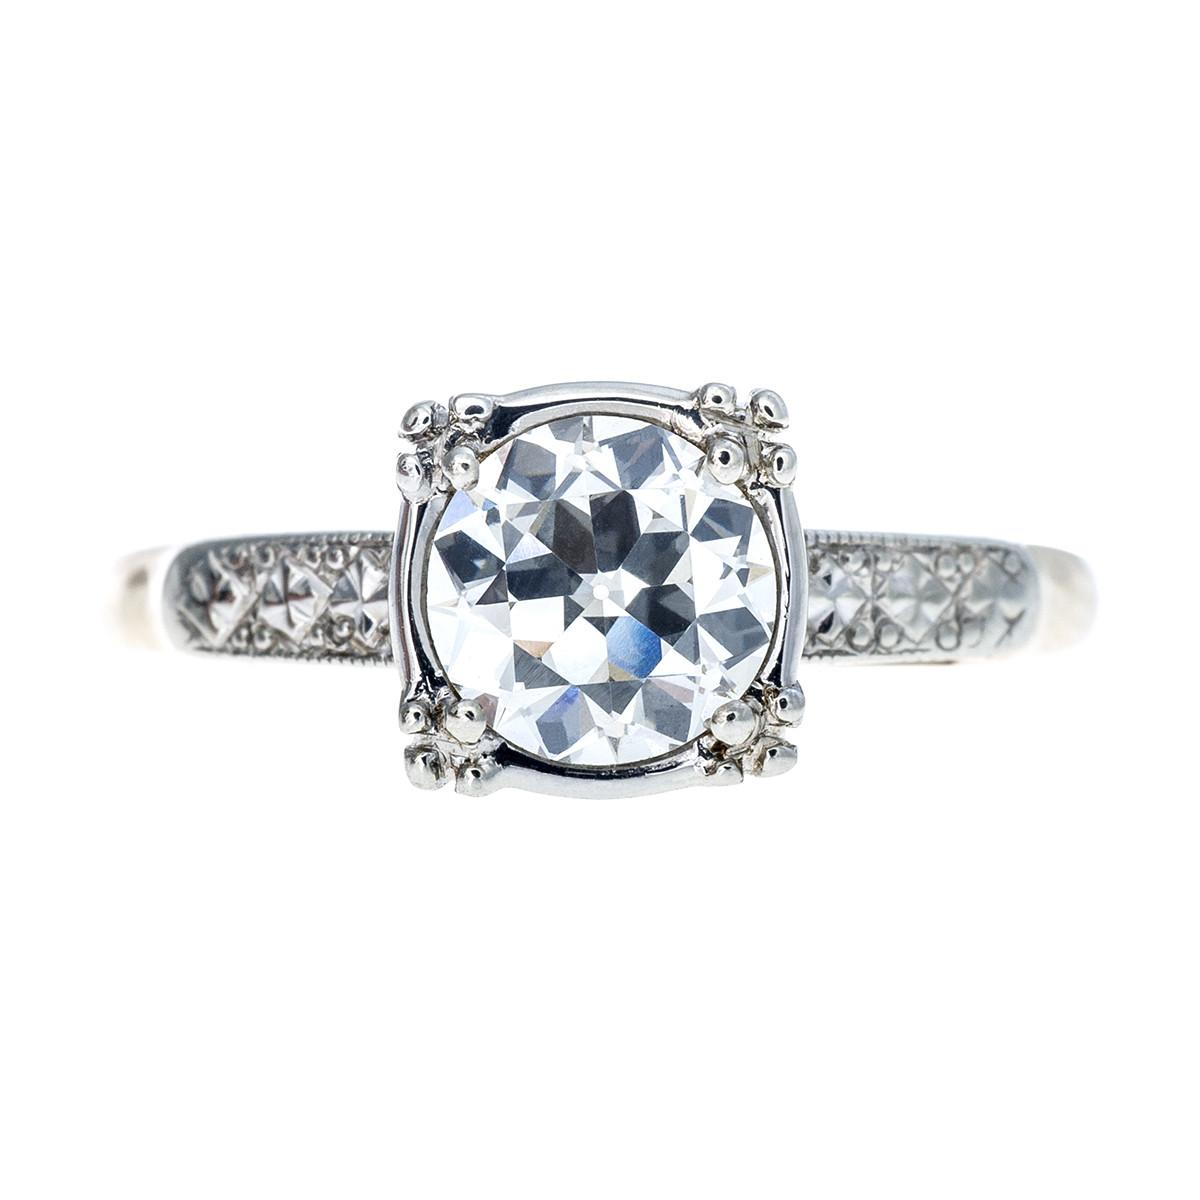 Vintage 0.95 CT Old European Cut Diamond Engagement Ring